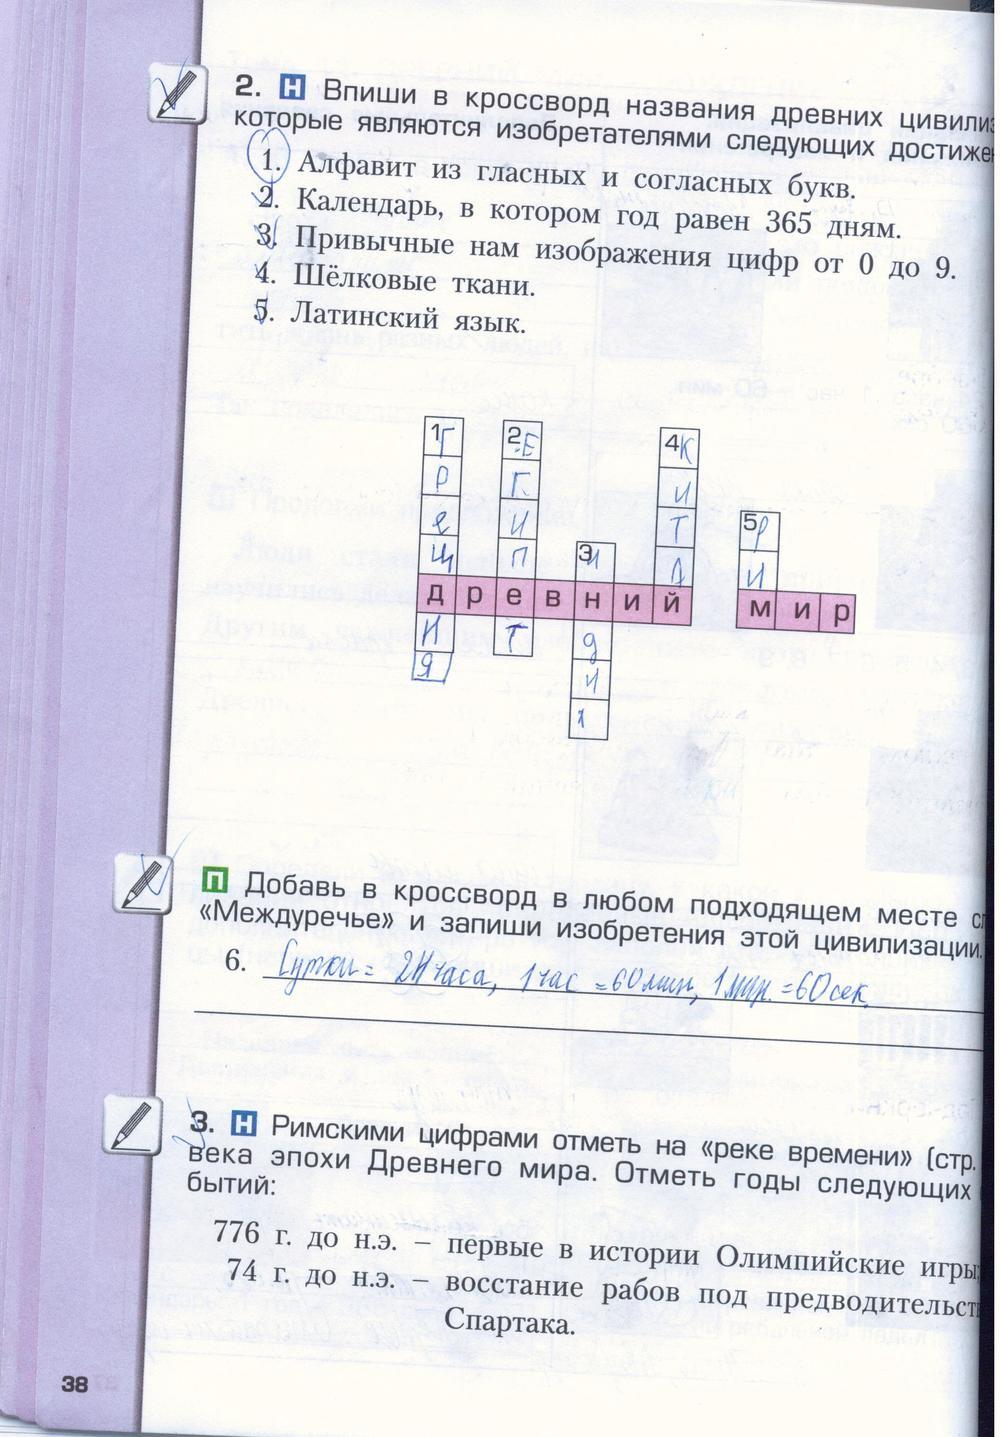 гдз по окружающему языку 4 класс рабочая тетрадь харитонова